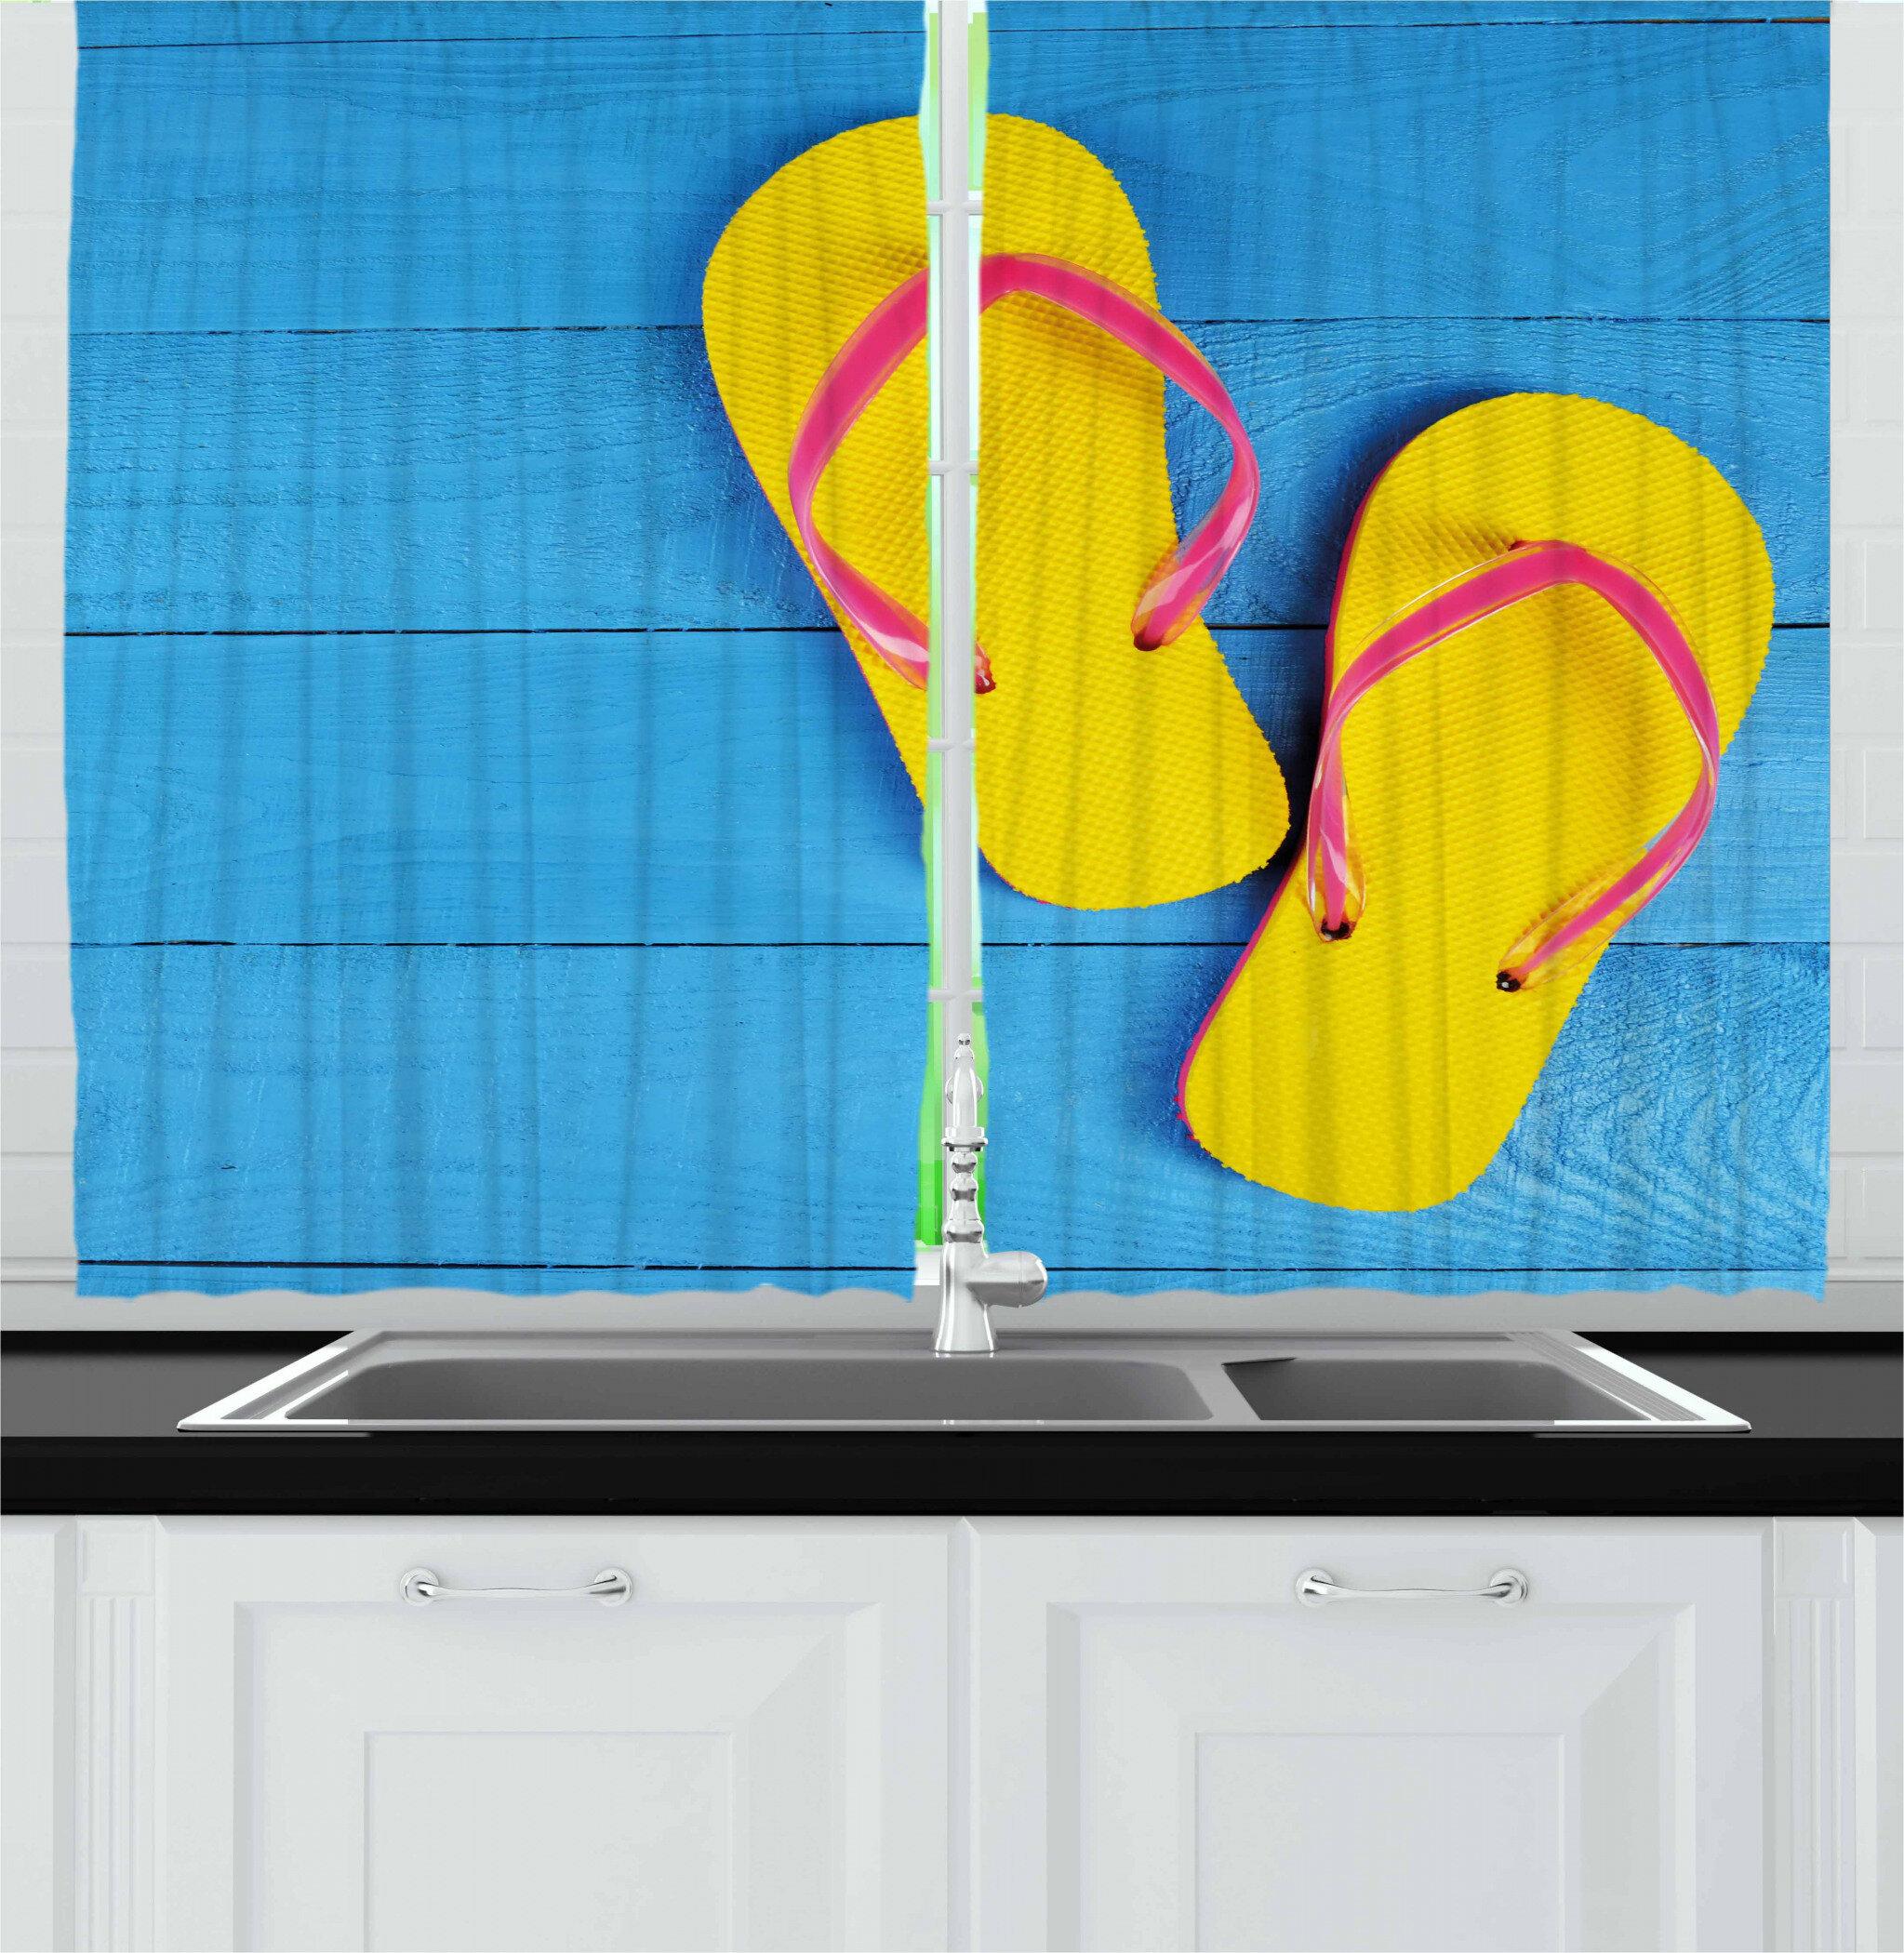 East Urban Home 2 Piece Flip Flops On Wooden Pier Cheerful Holiday Travel Relax Image Kitchen Curtain Wayfair